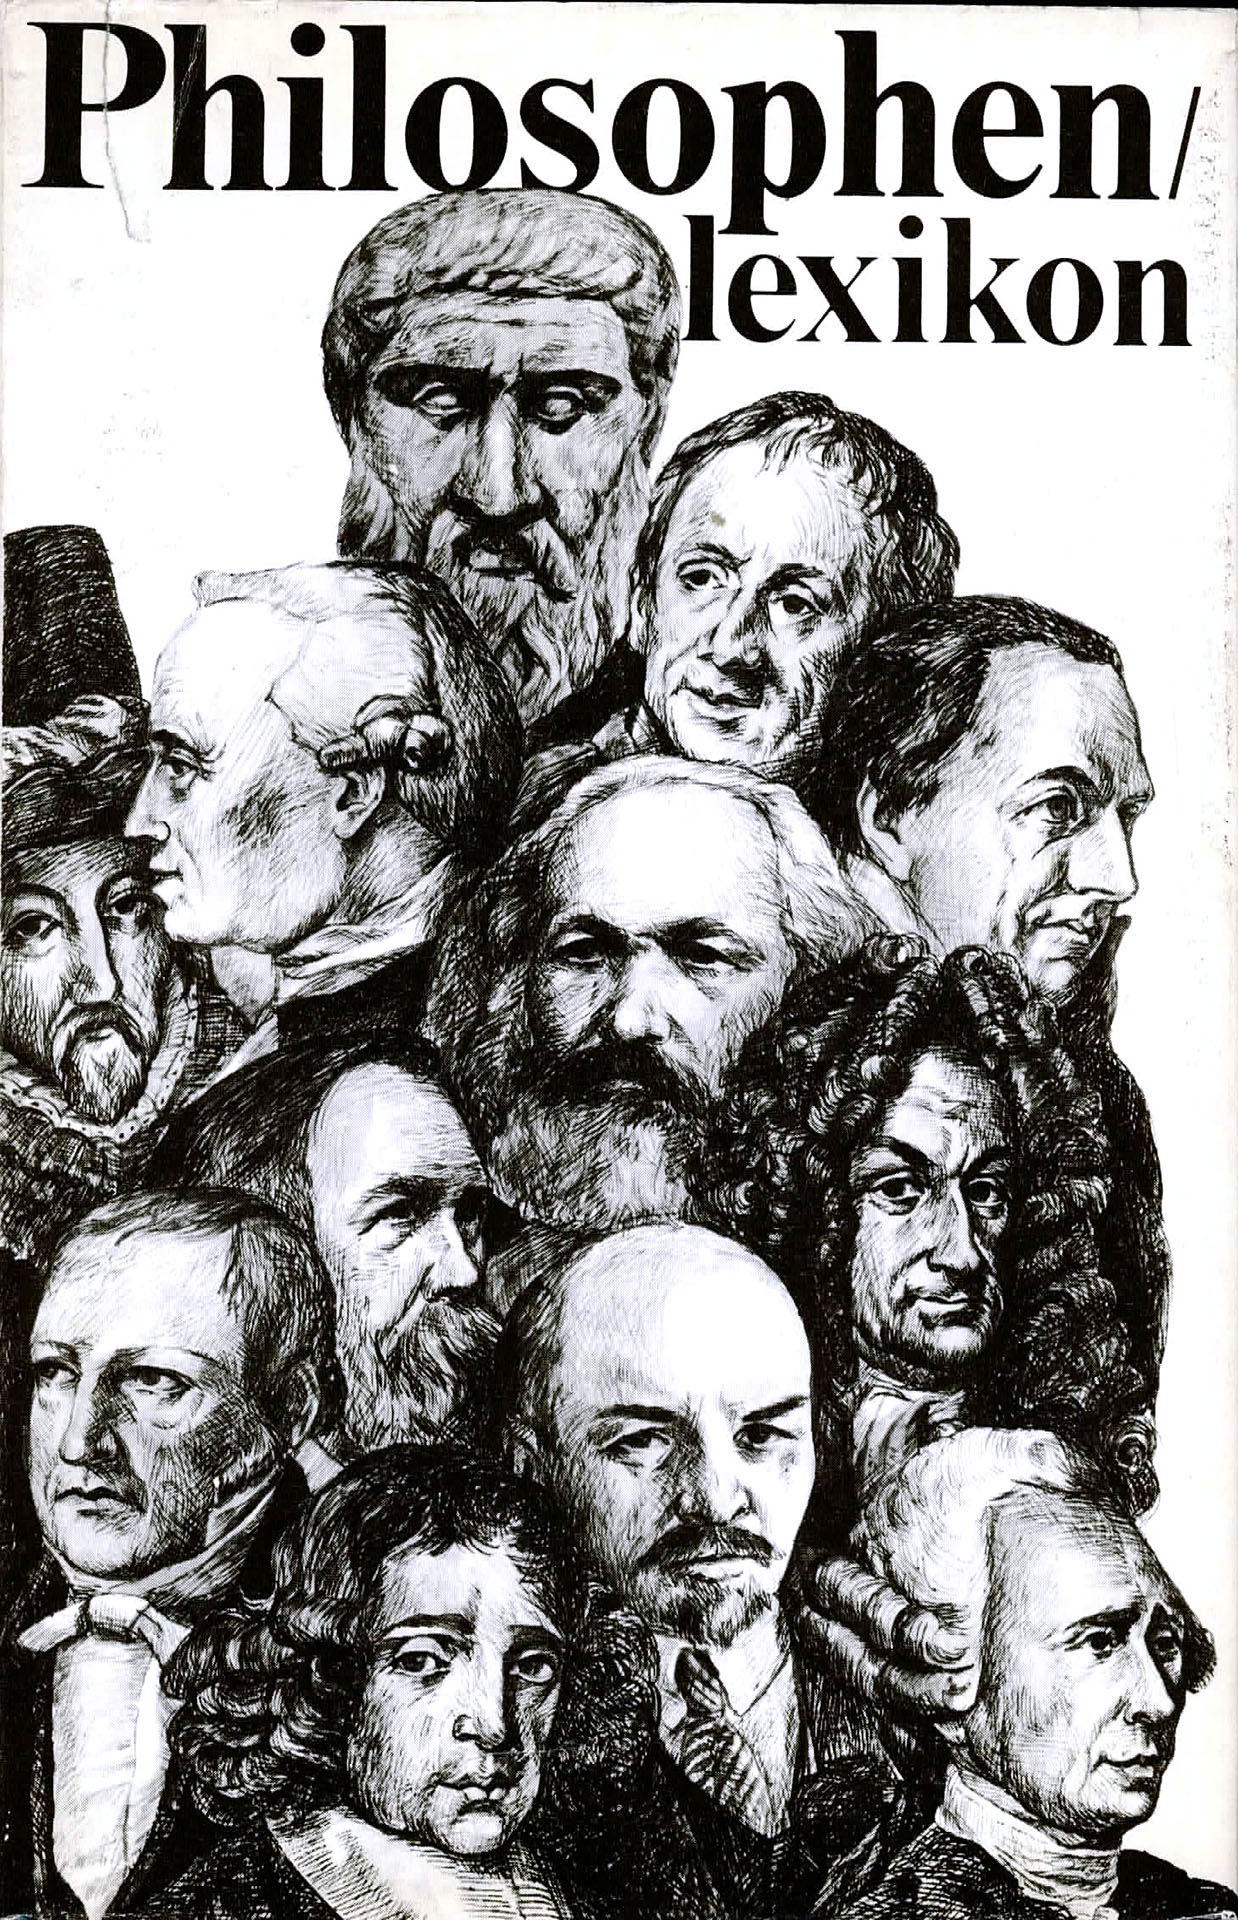 Philisophenlexikon - Autorenkollektiv